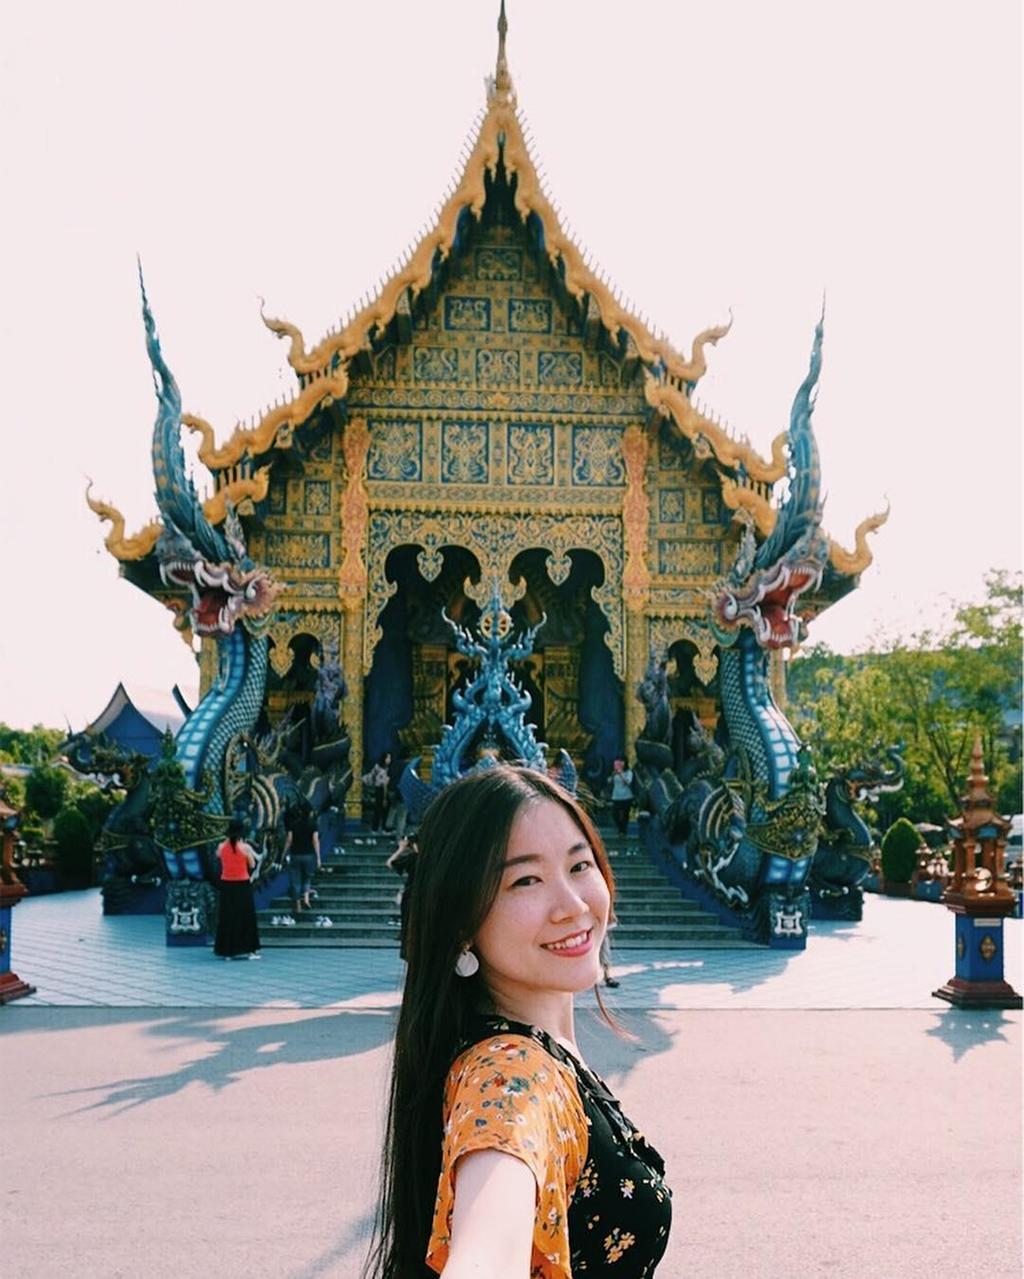 ghe-thai-lan-check-in-song-ao-tai-ngoi-chua-xanh-dat-vang-sang-chanh-ivivu-6